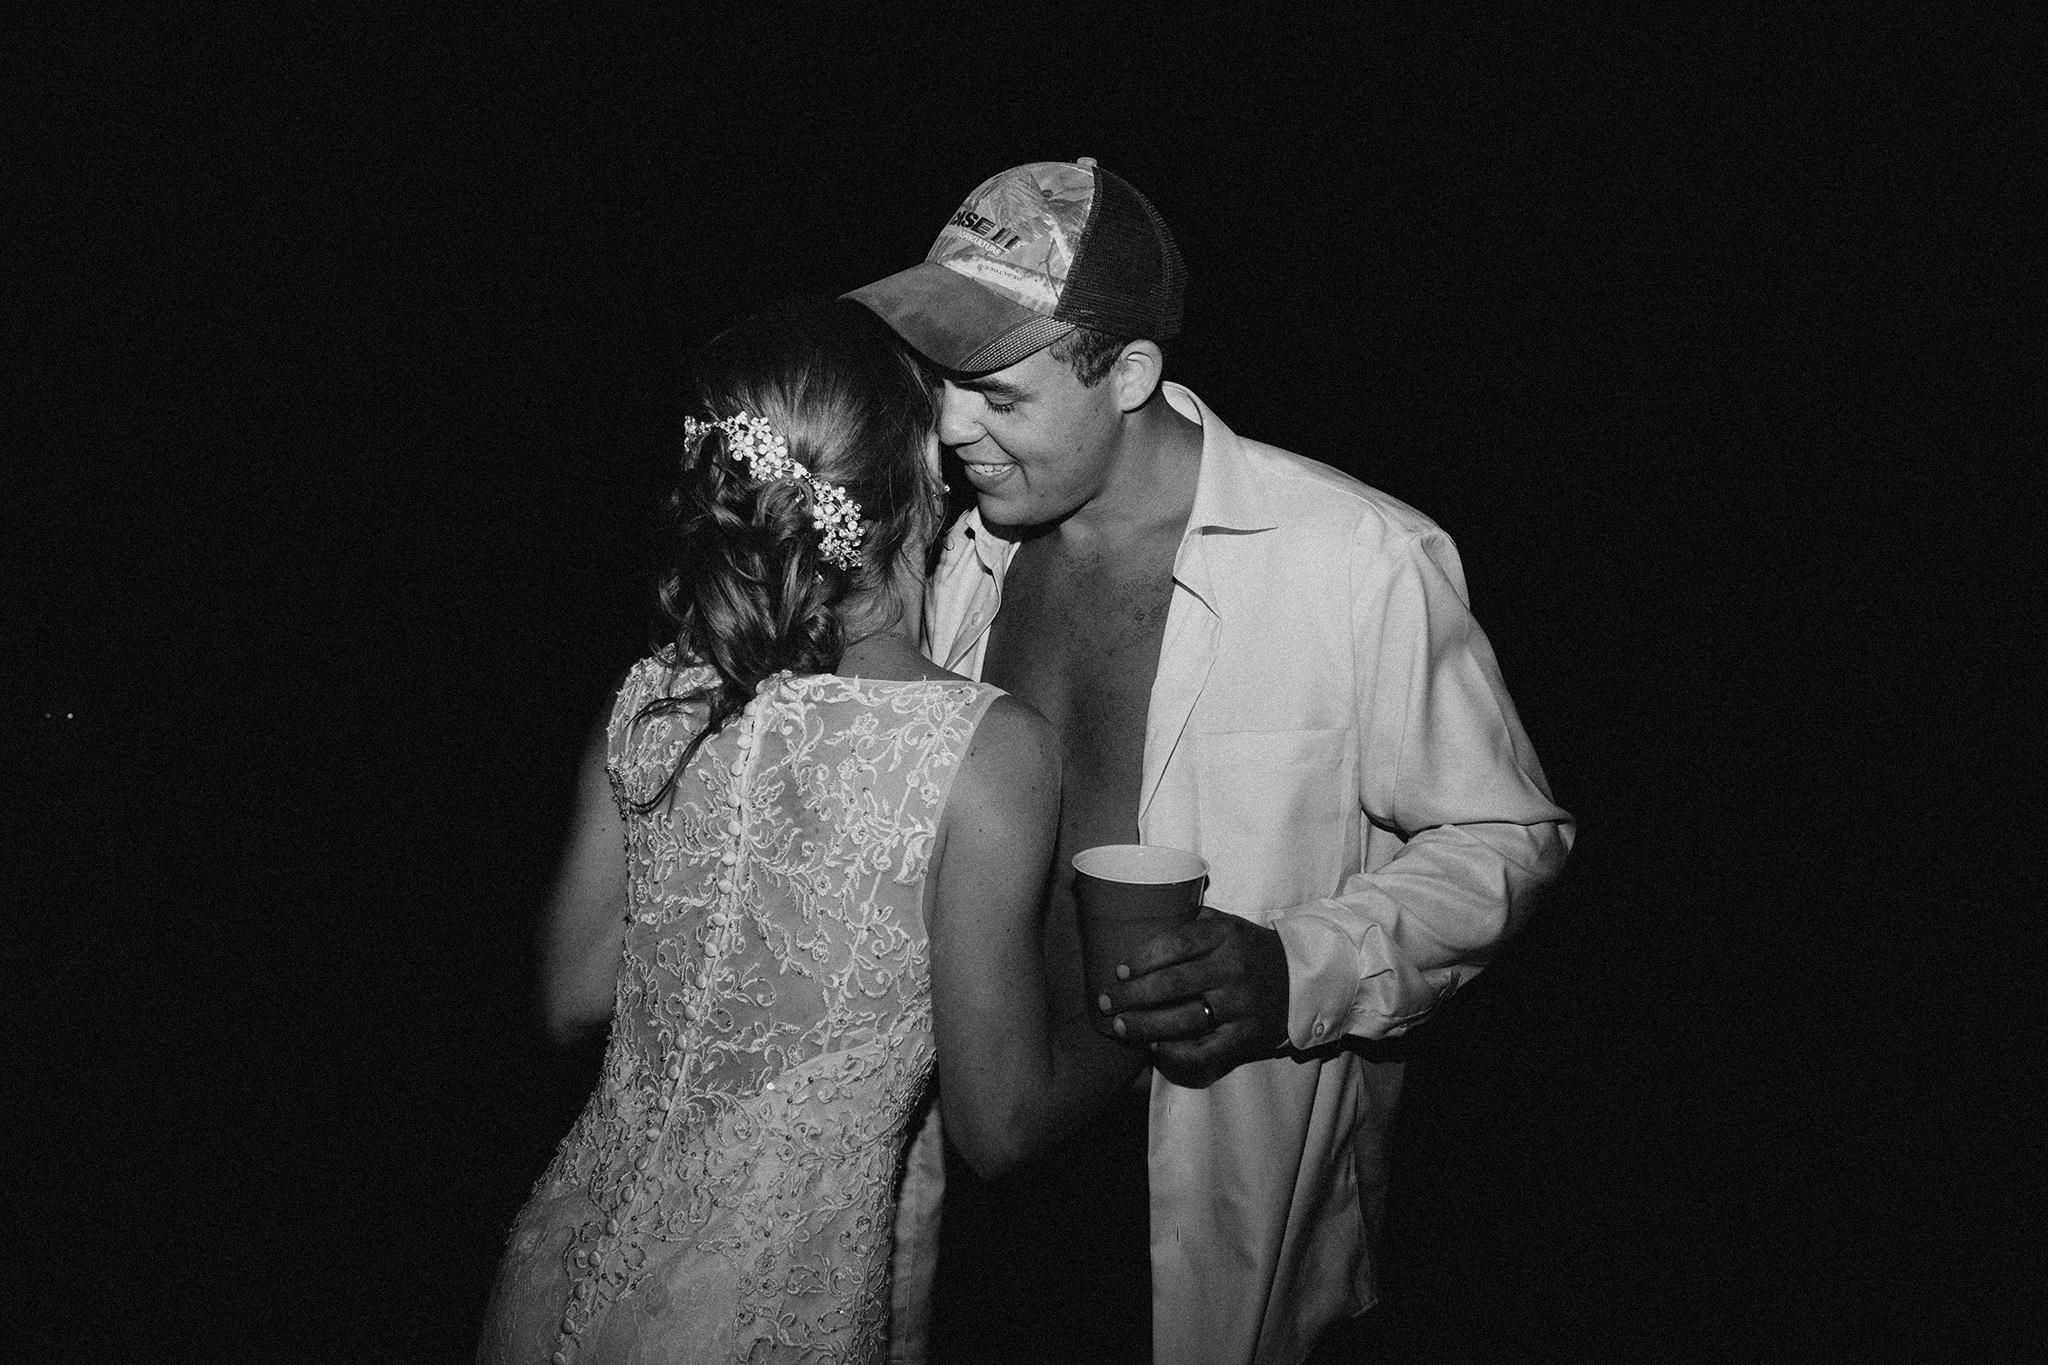 vermont-wedding-photographer-outdoor-farm-wedding-90.jpg